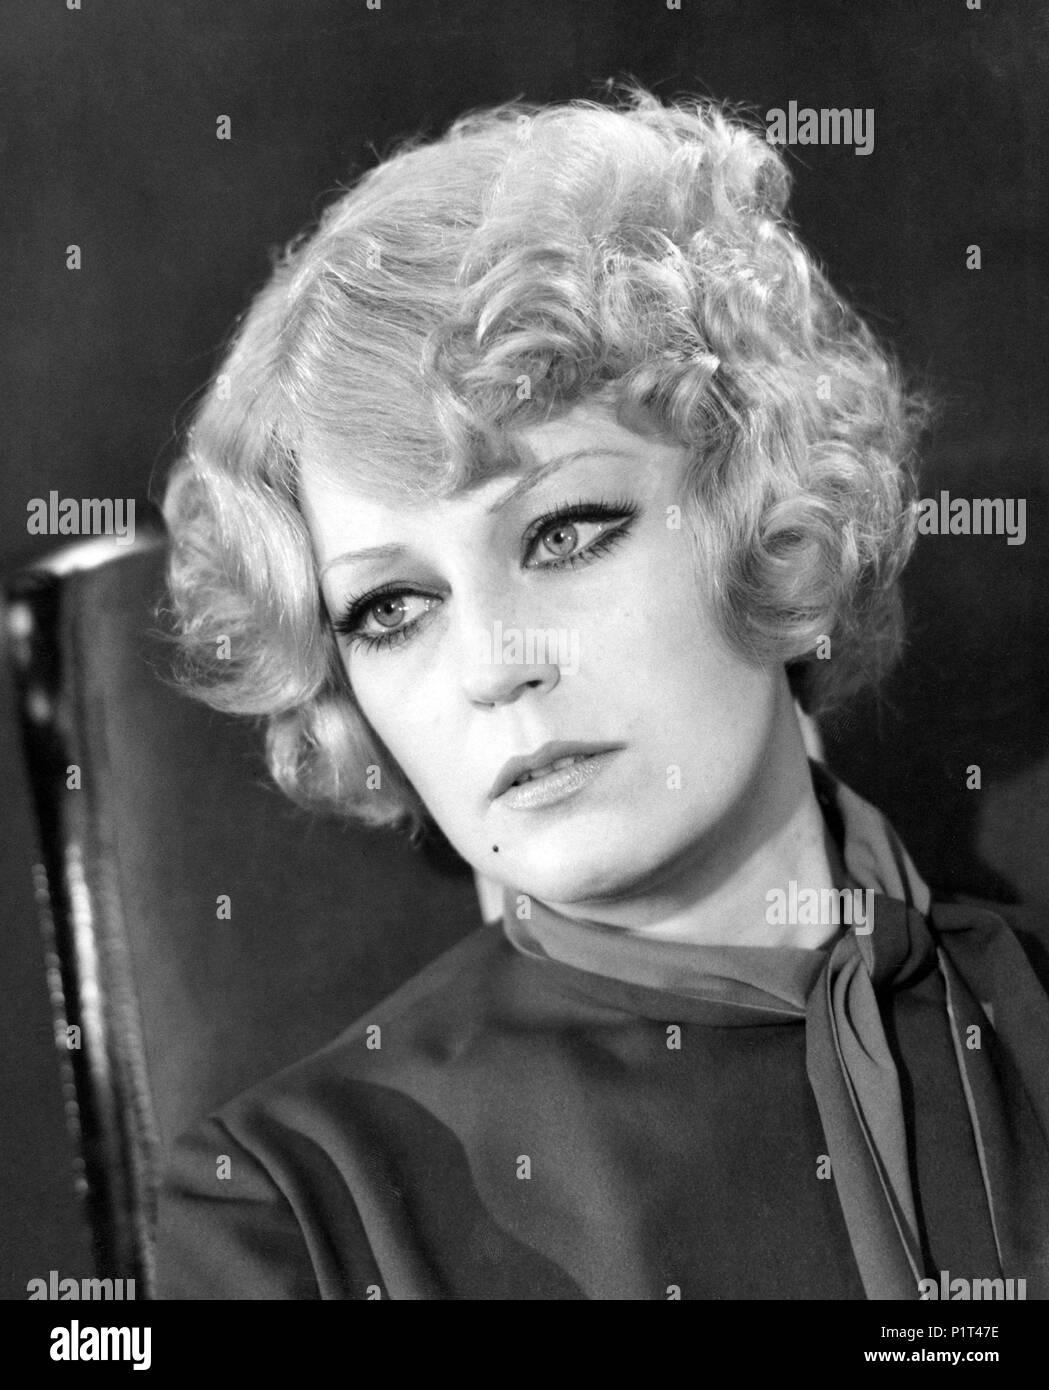 Original Film Title La Duda English Title Doubt Film Director Rafael Gil Year 1972 Stars Analia Gade Credit Coral P C Album Stock Photo Alamy